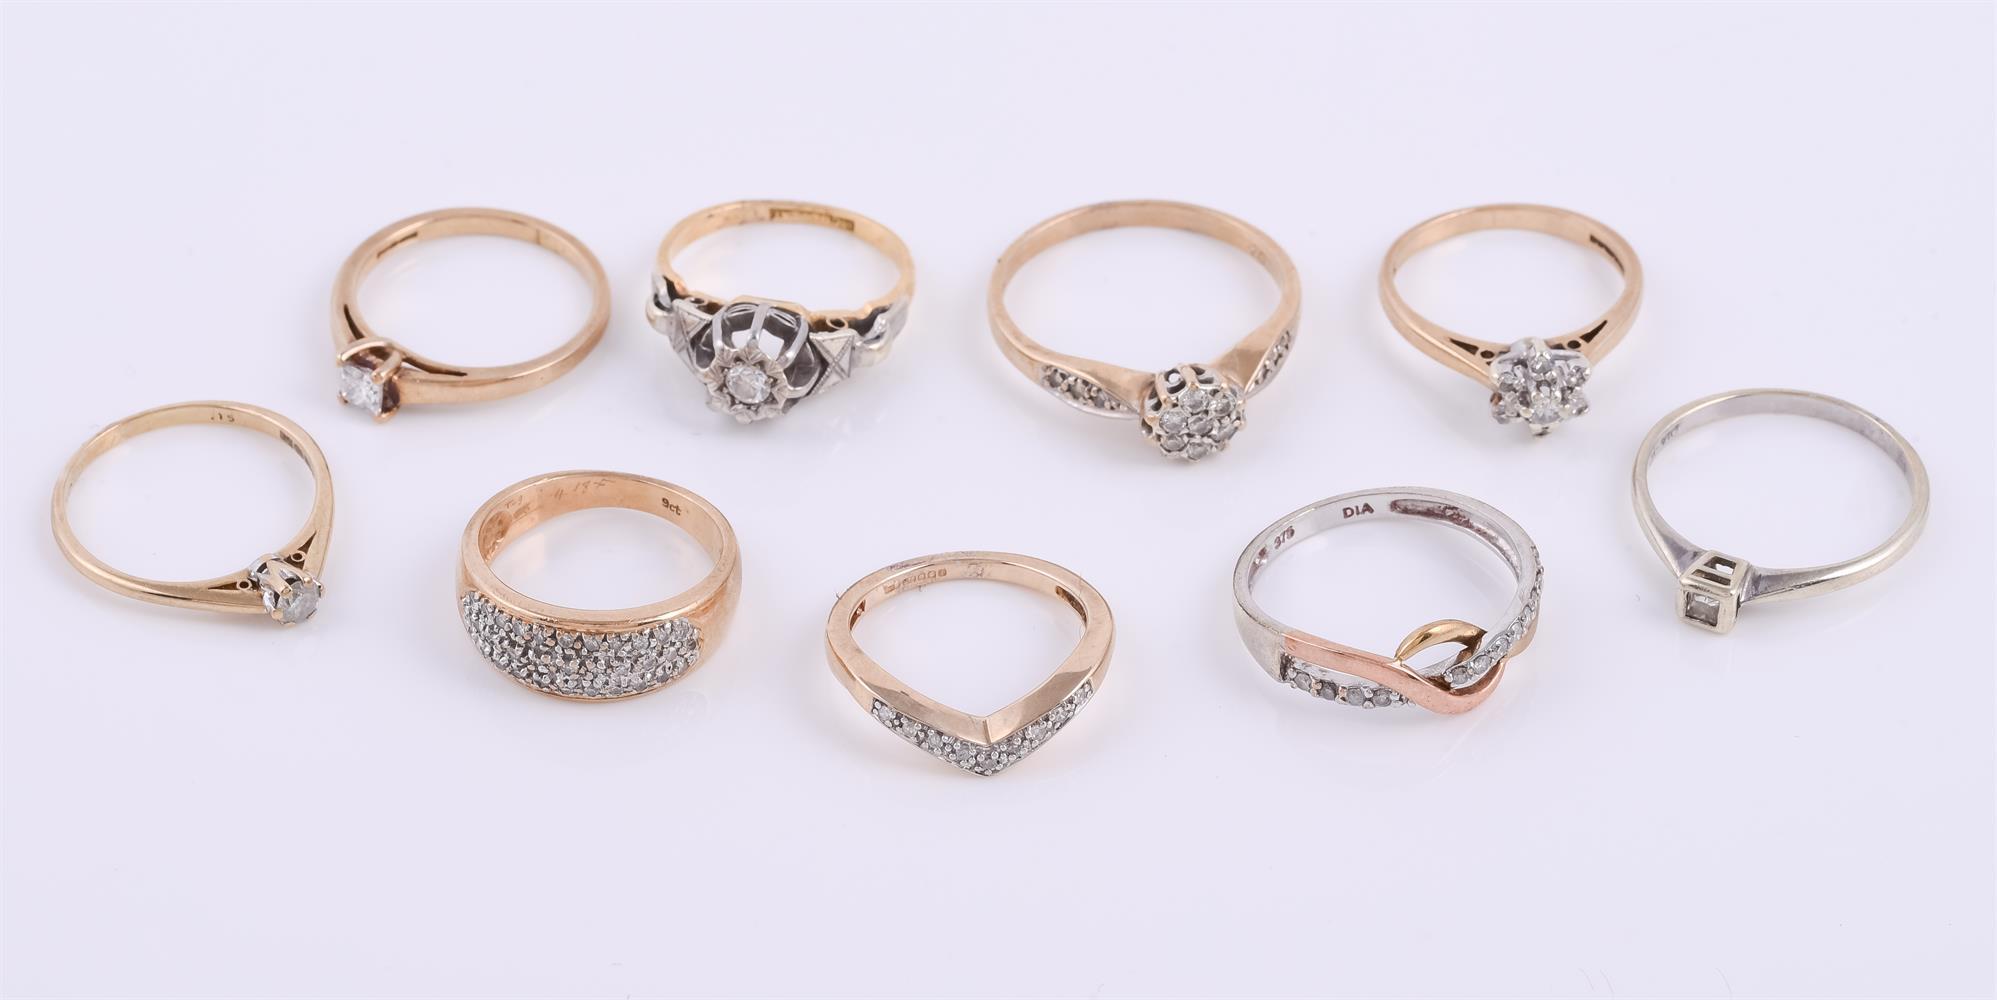 An illusion set diamond ring - Image 2 of 2